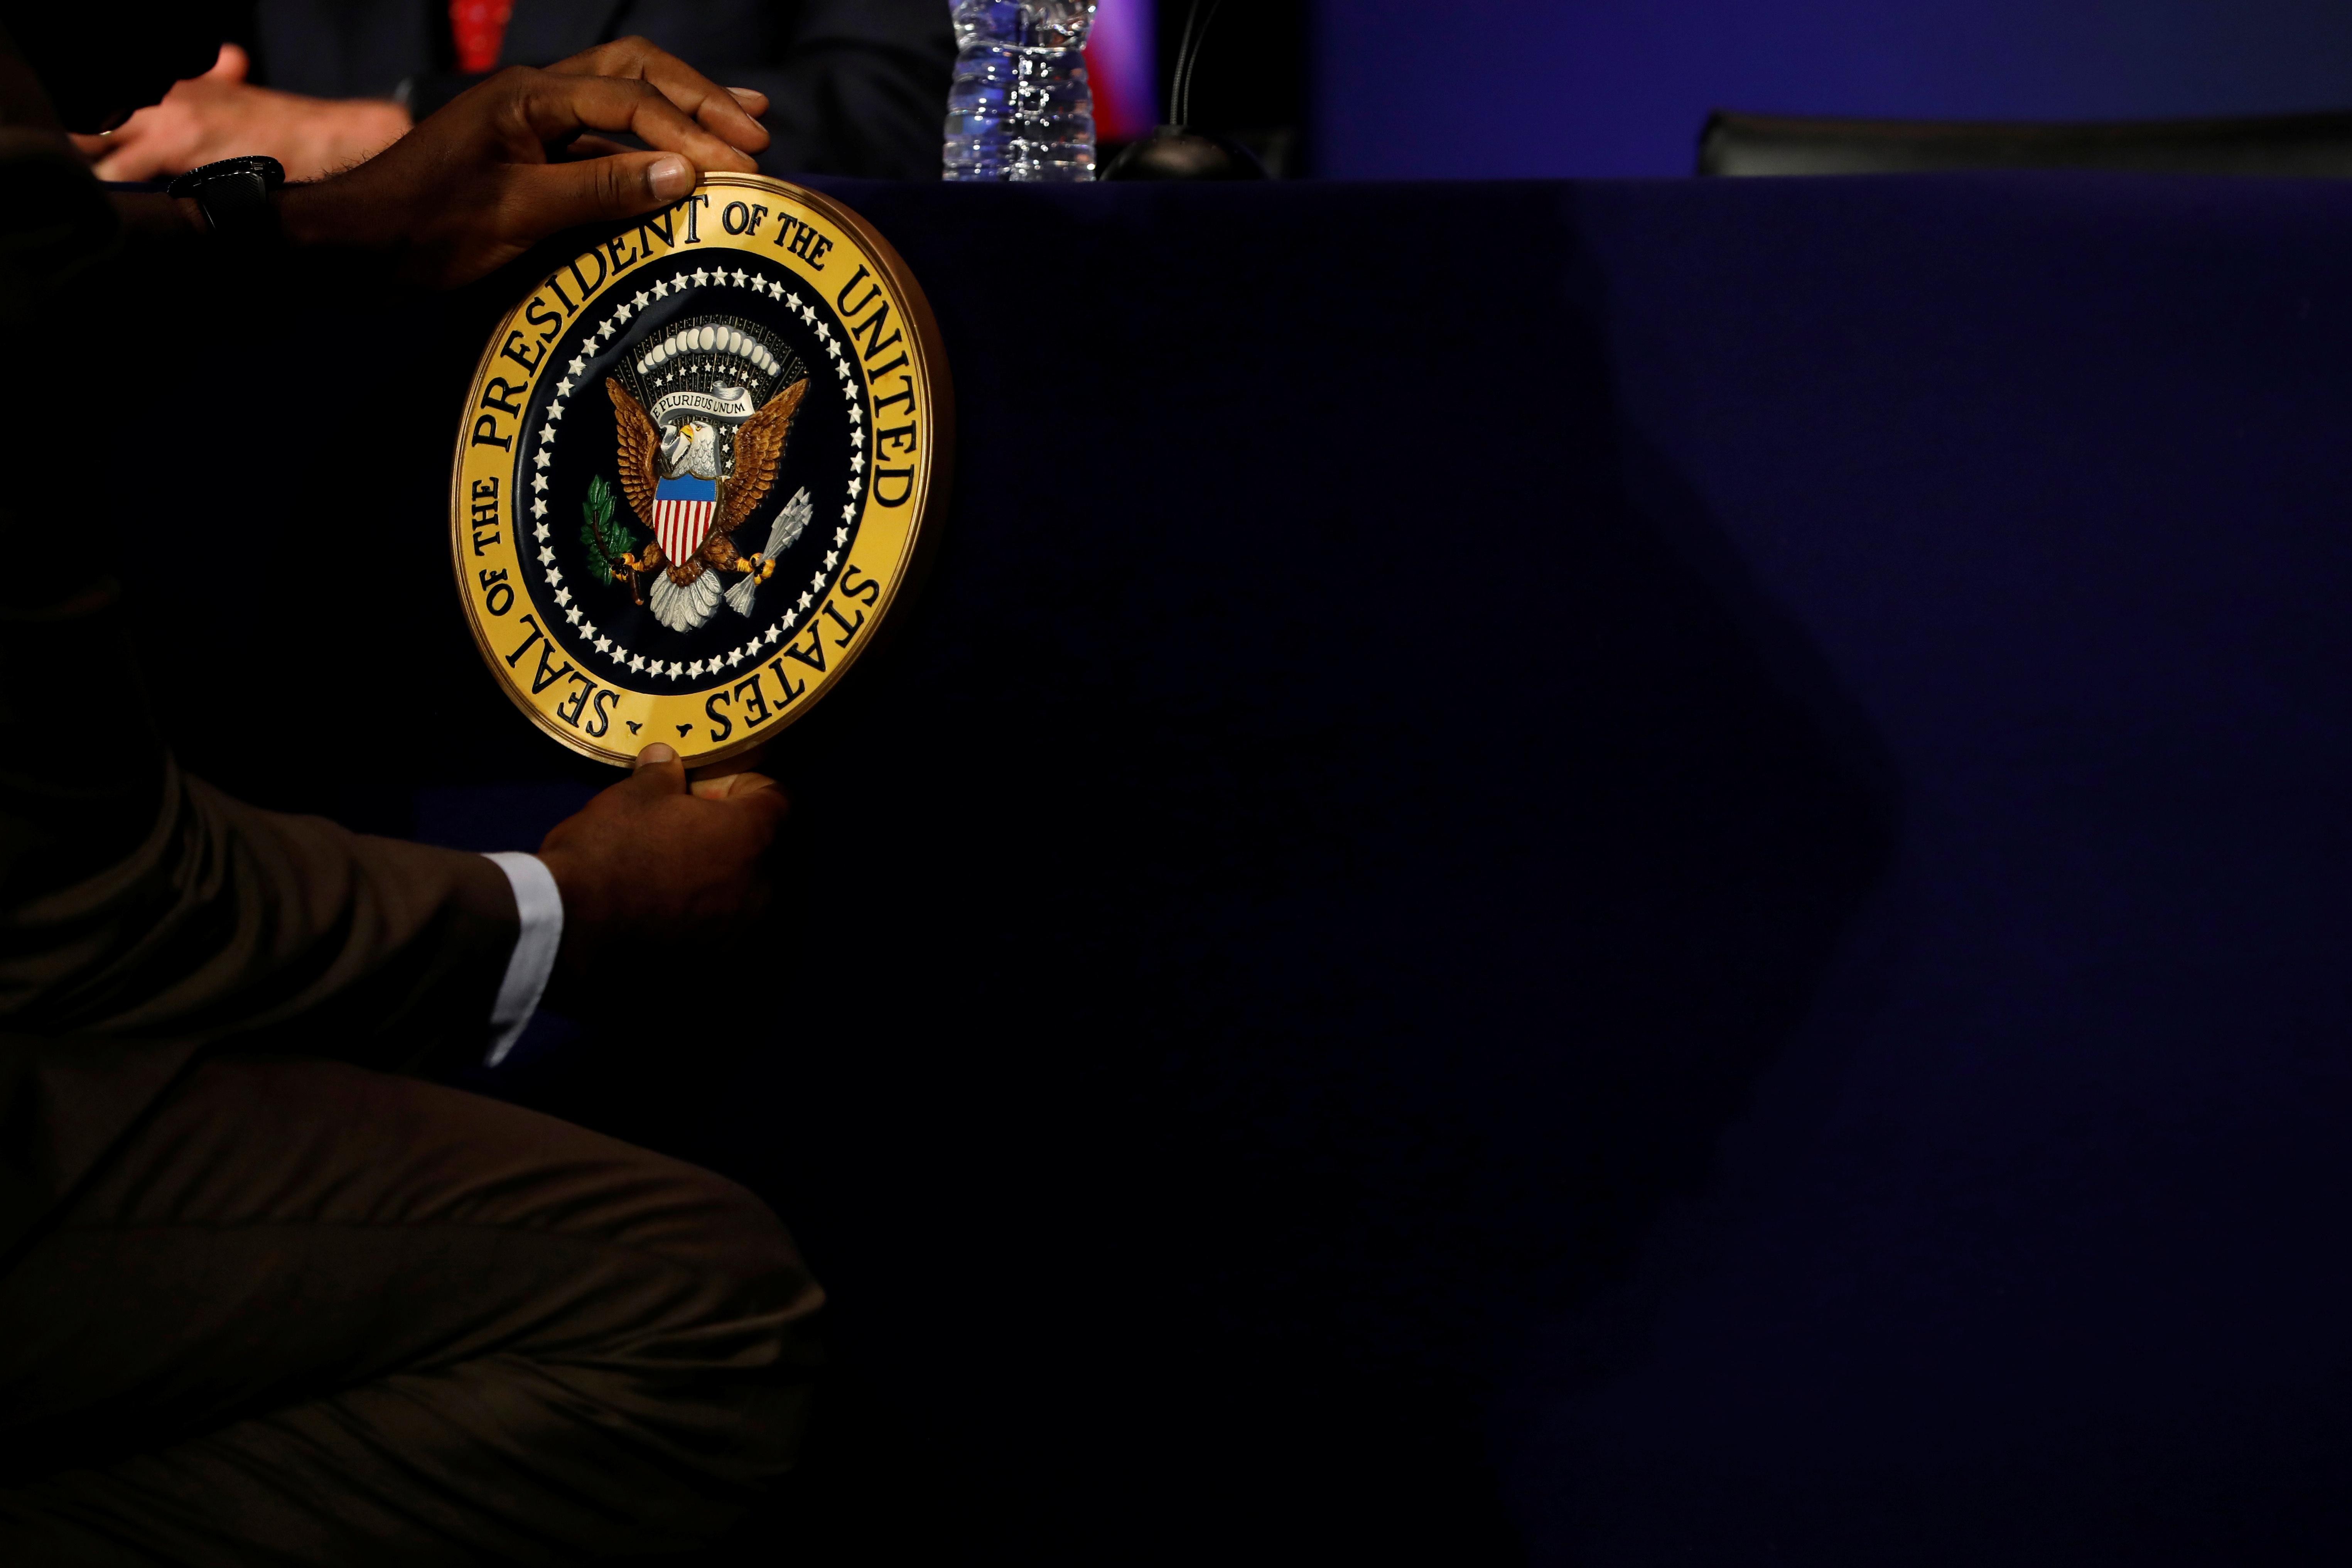 Factbox: Two Republicans, 22 Democrats vie for U.S. presidential nominations